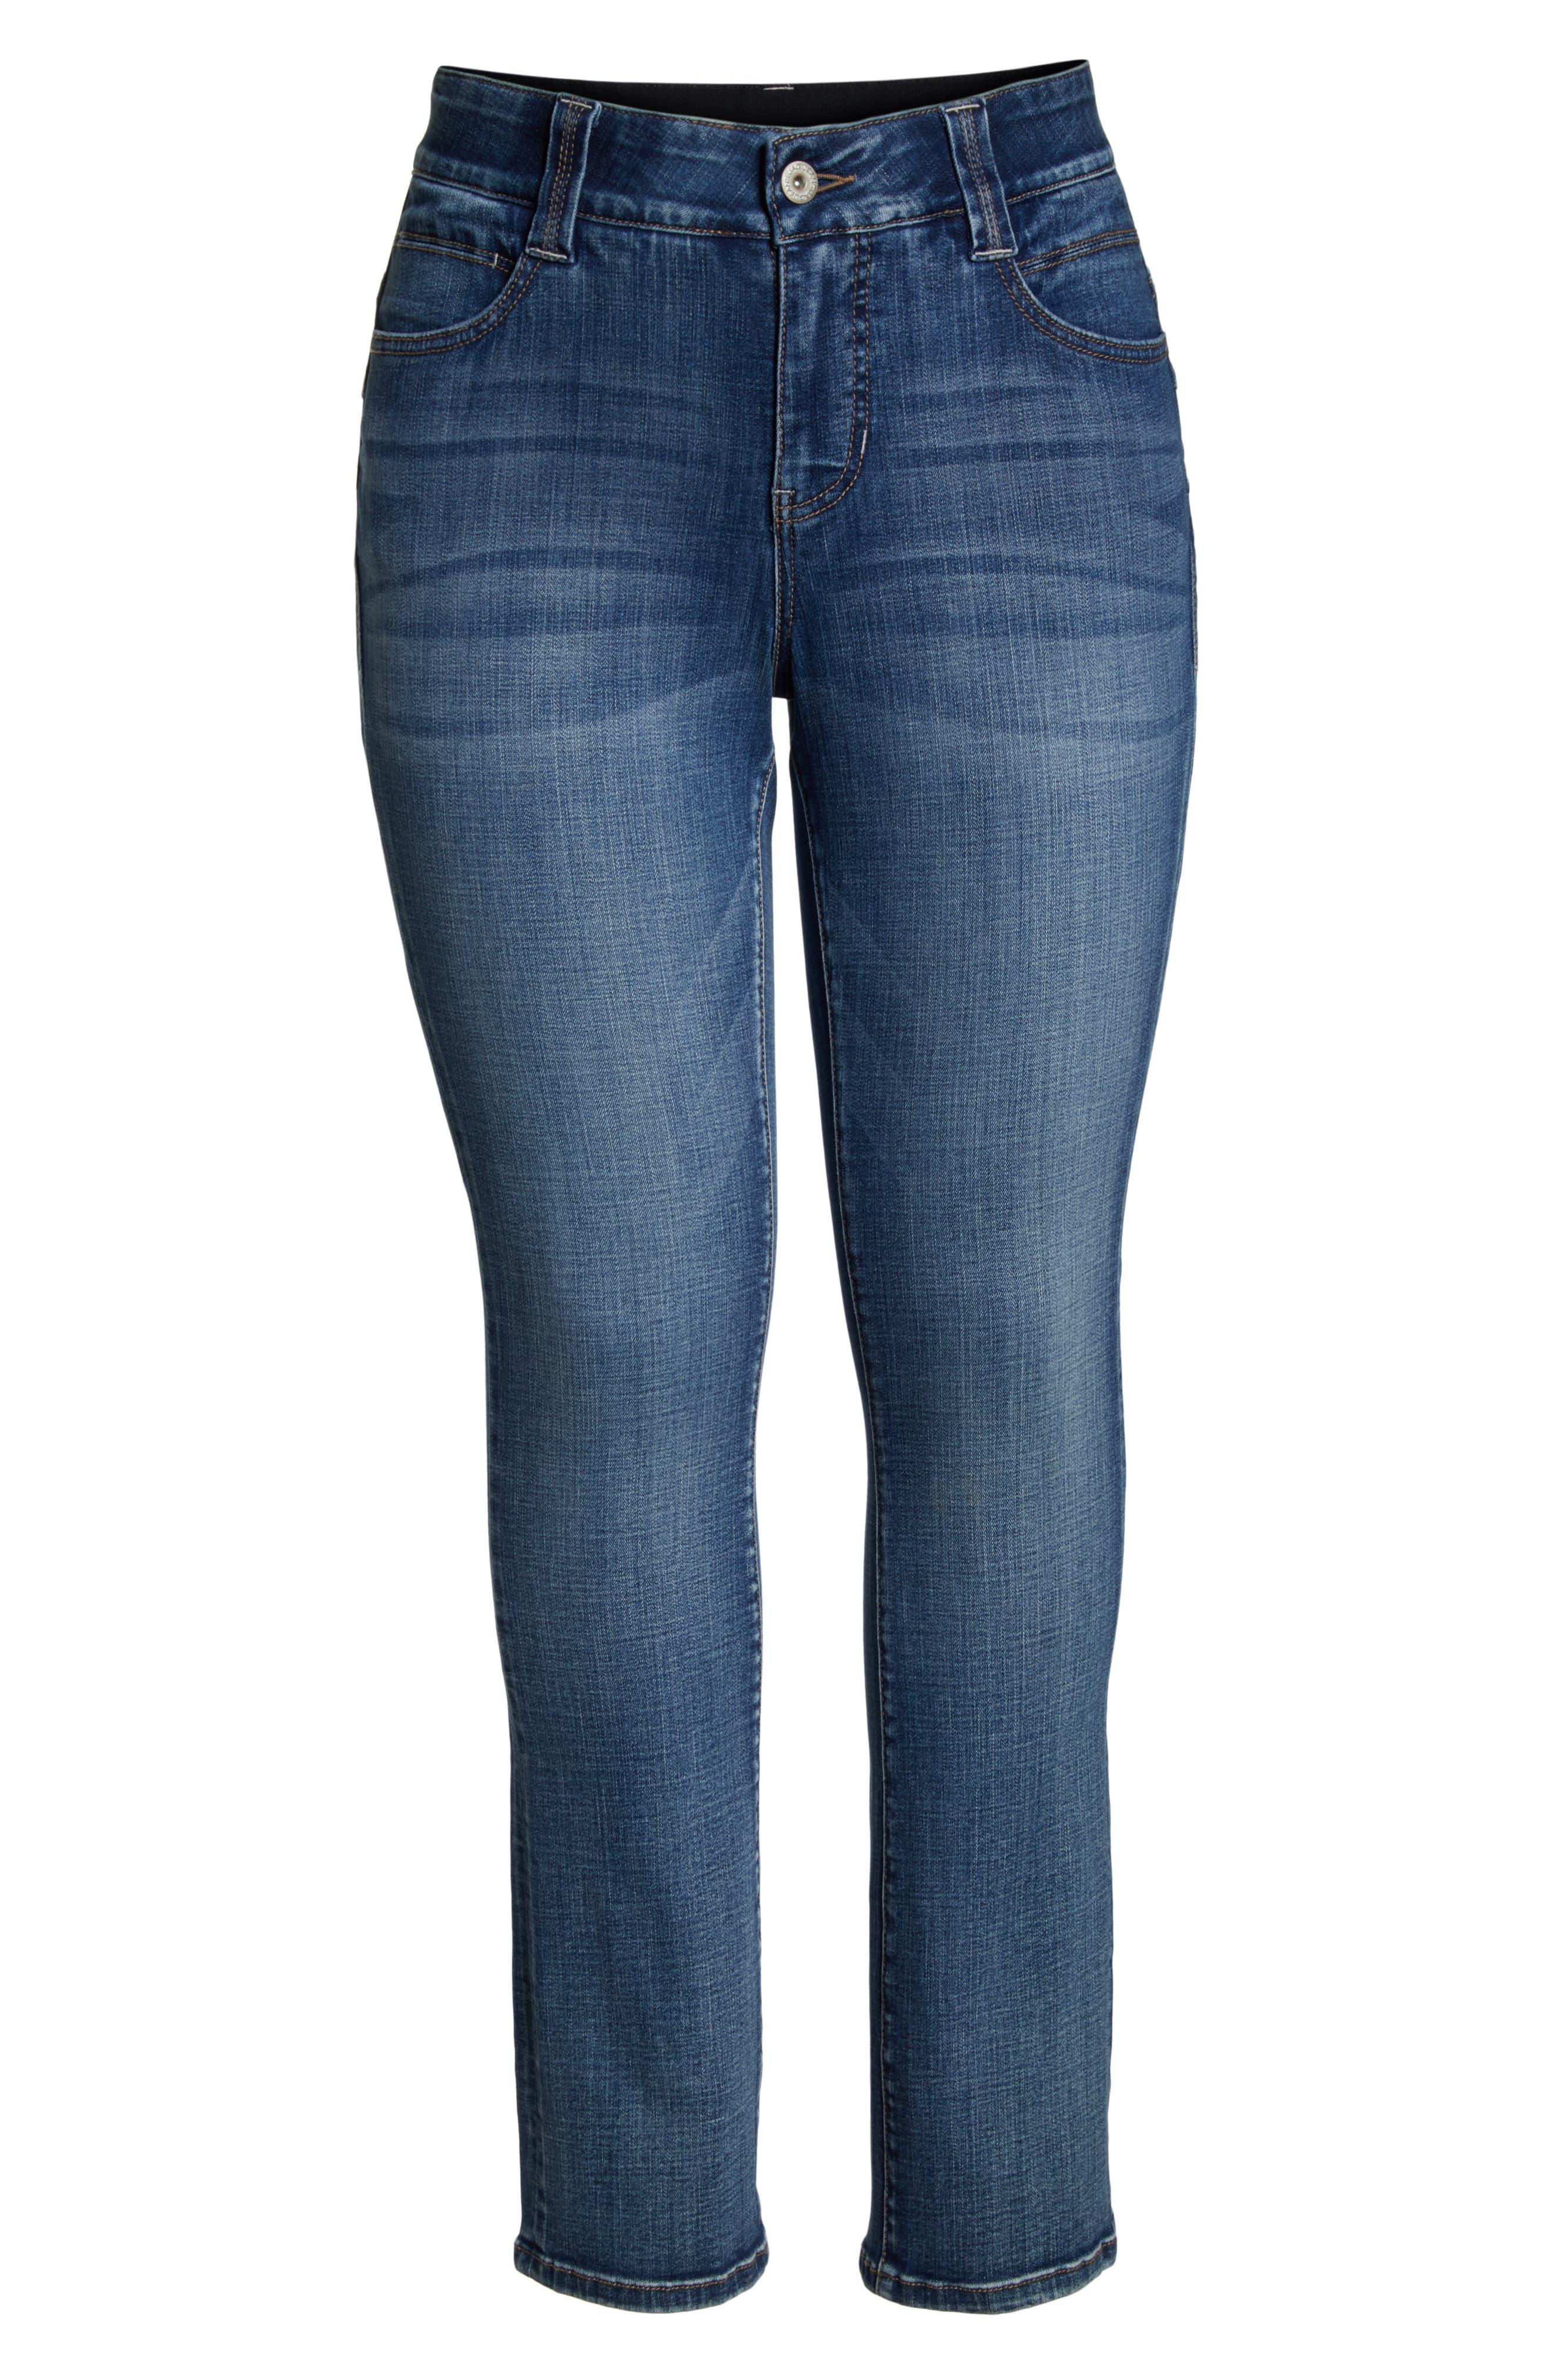 JAG JEANS, Eloise Bootcut Stretch Jeans, Alternate thumbnail 7, color, MED INDIGO